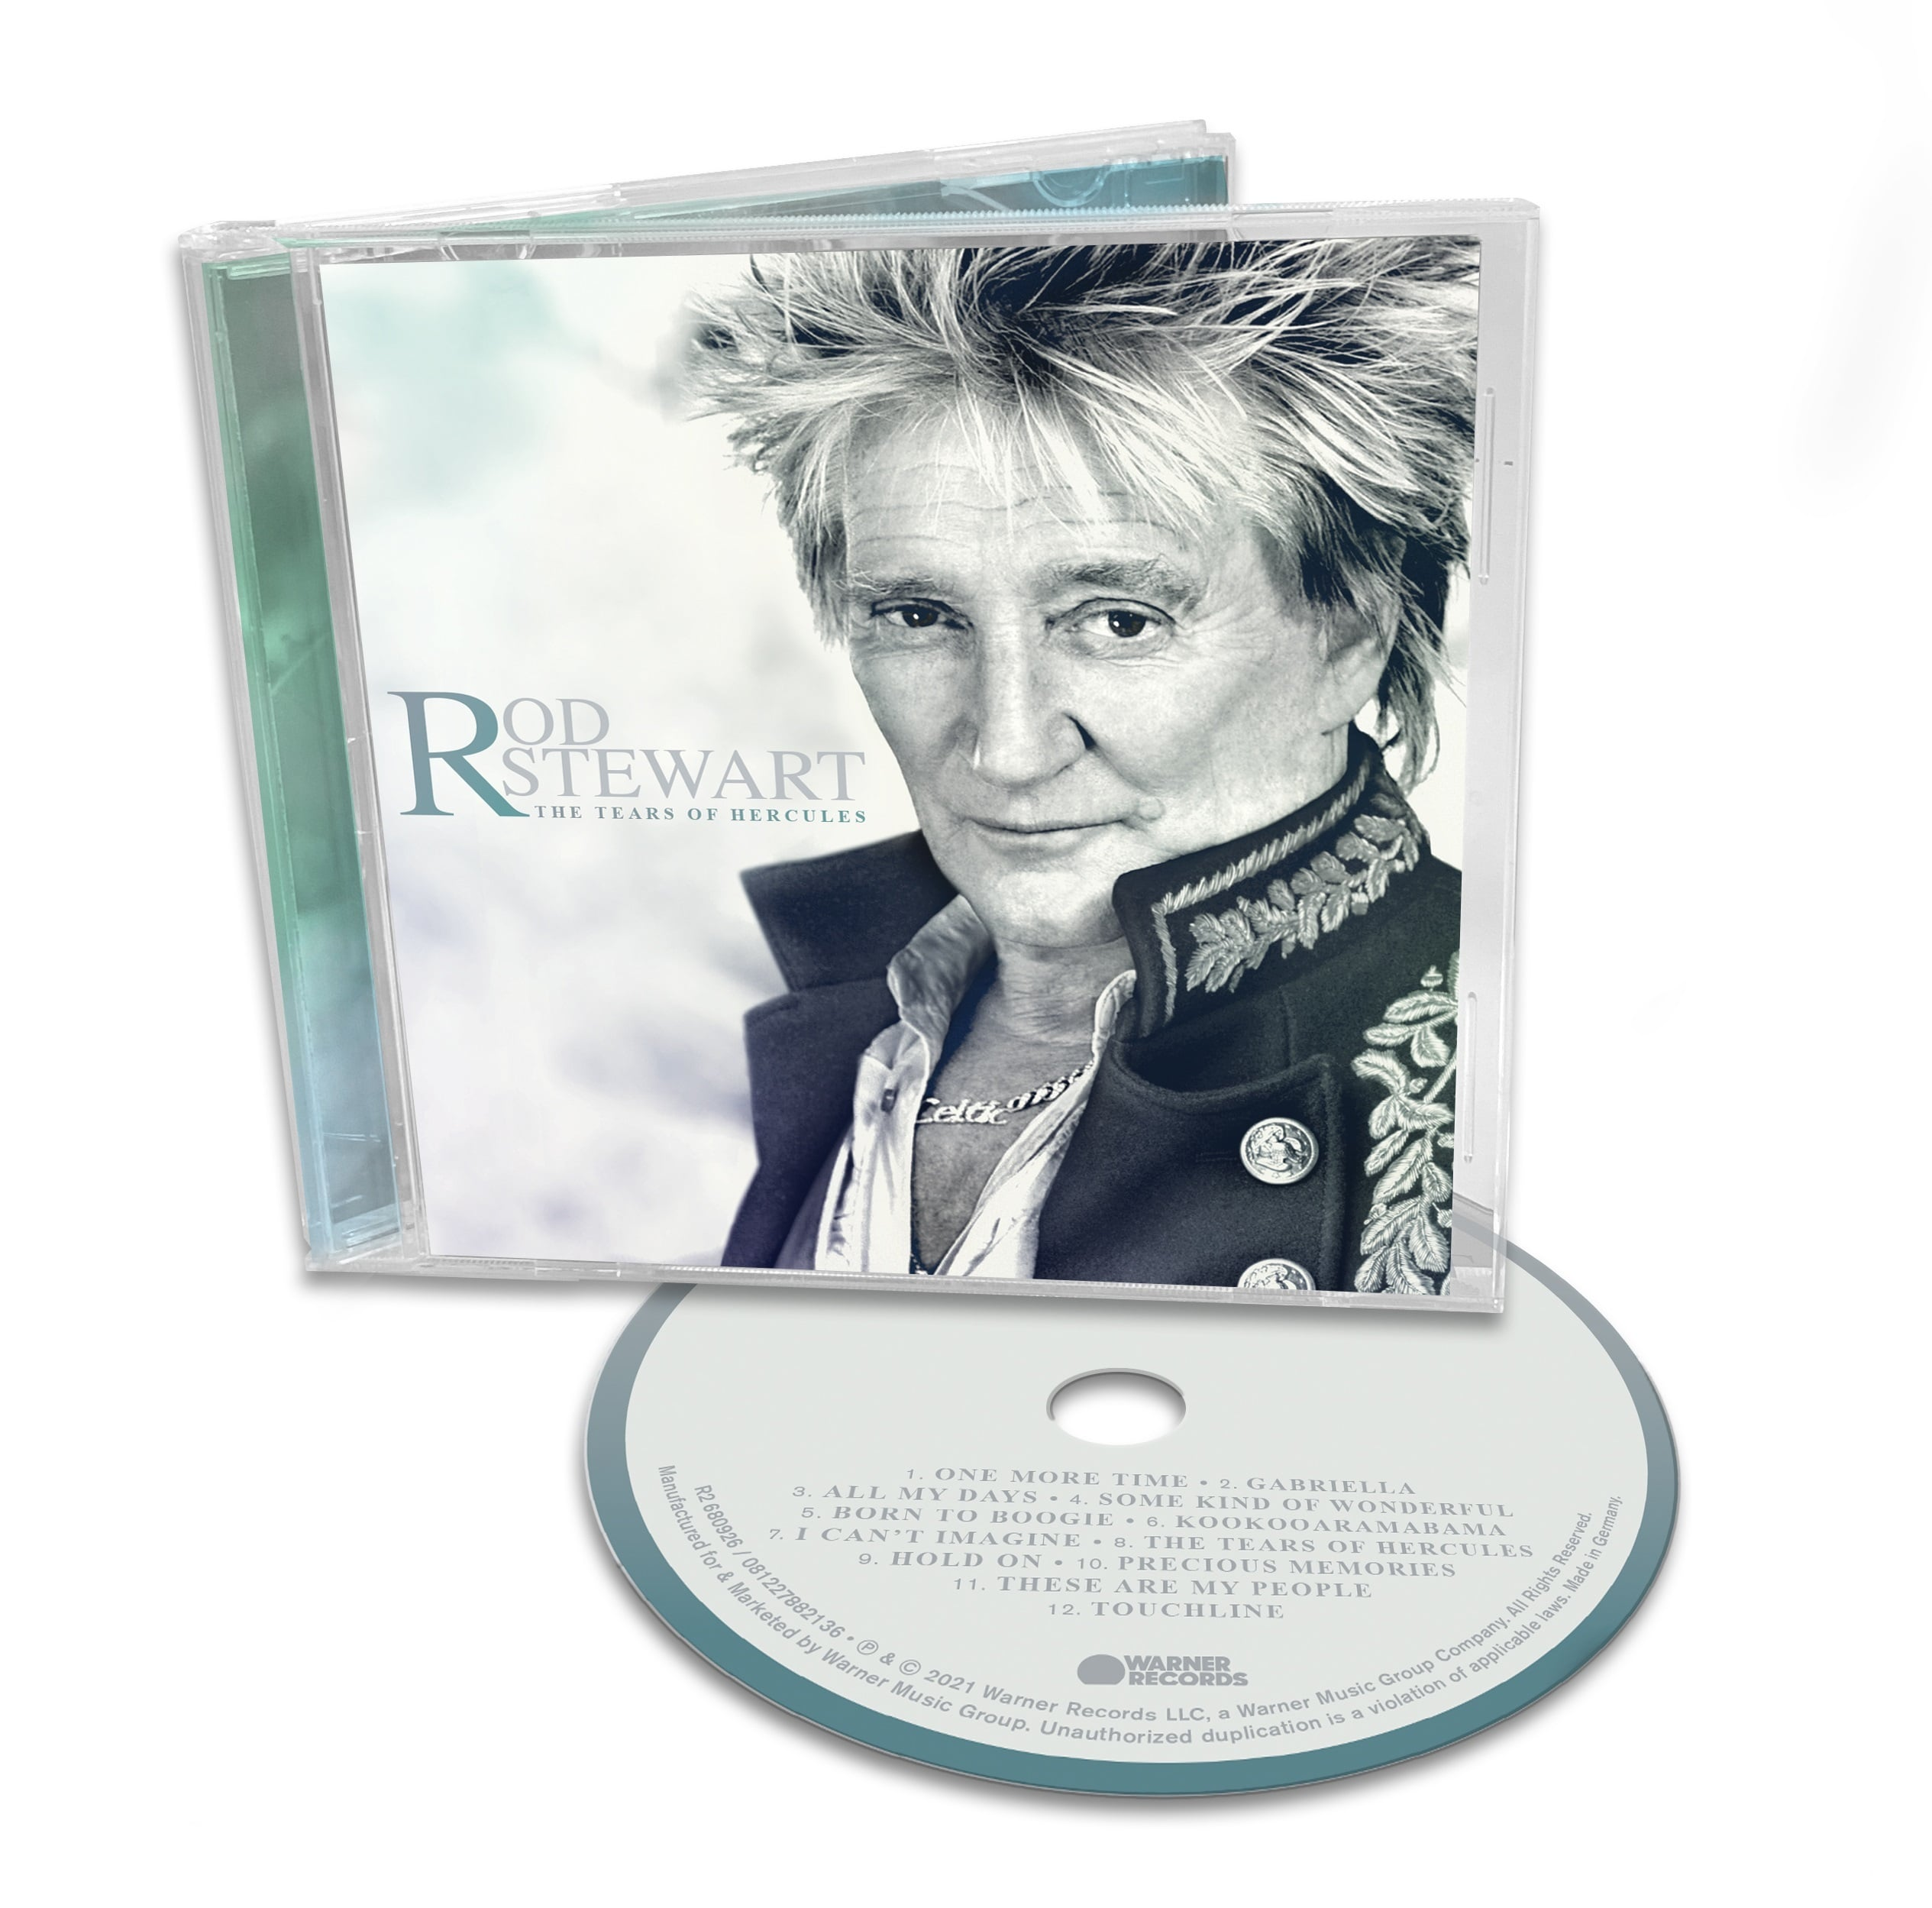 Rod Stewart - CD THE TEARS OF HERCULES